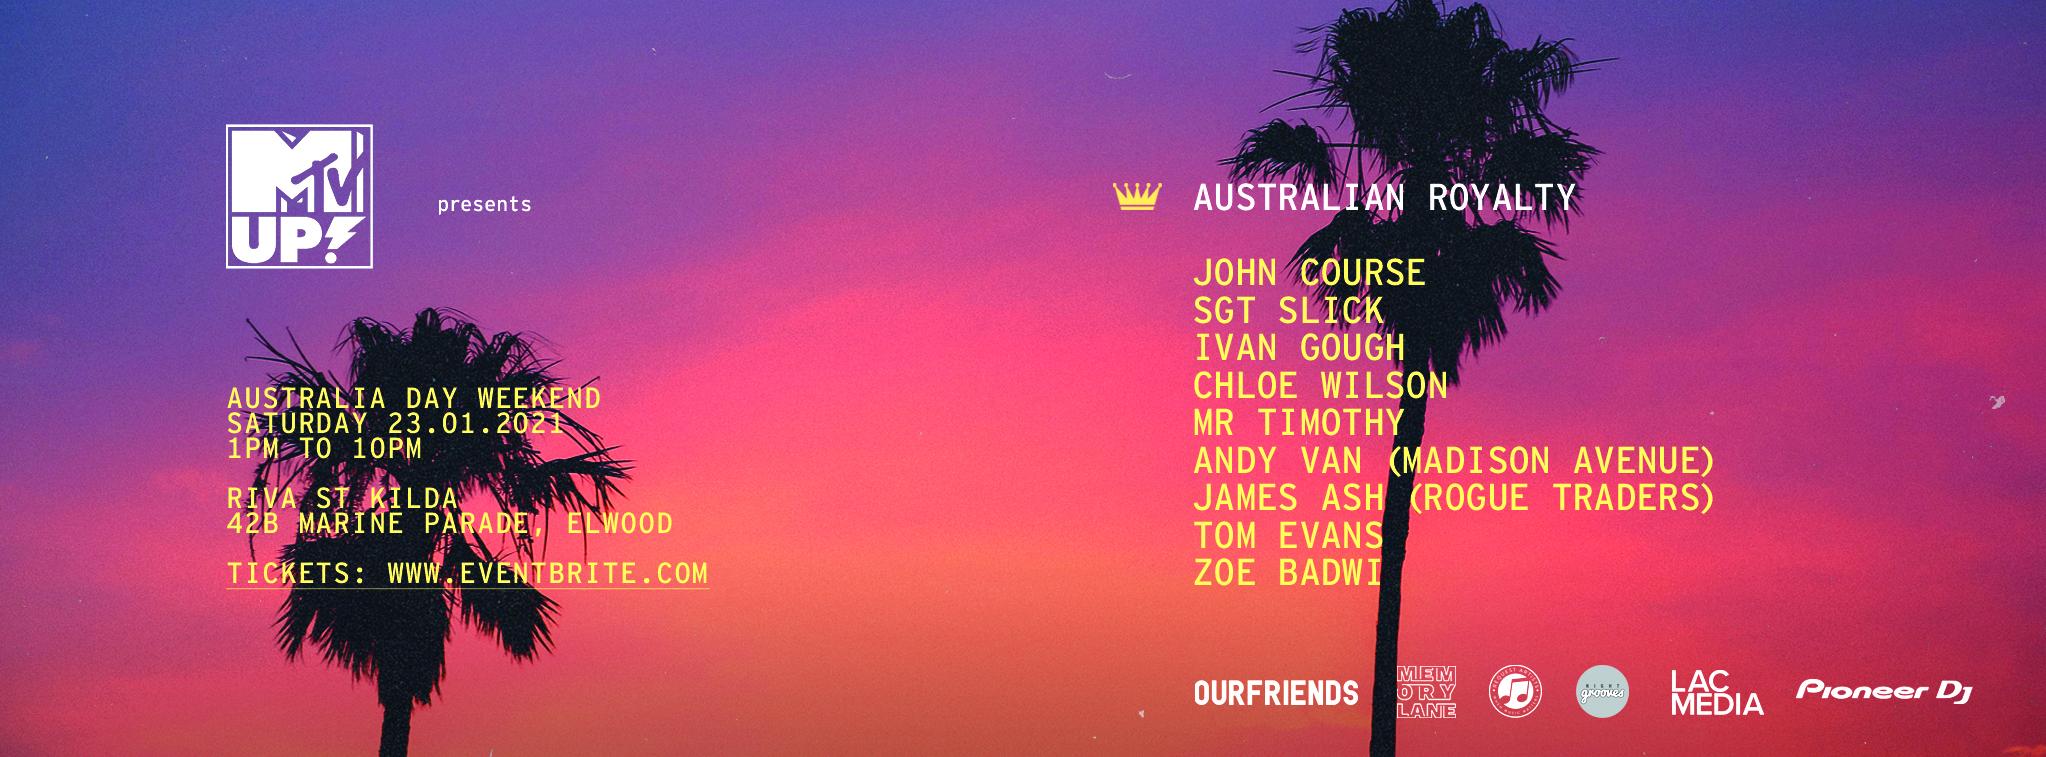 Cover_AUSTRALIA DAY 2021 FLYER_02